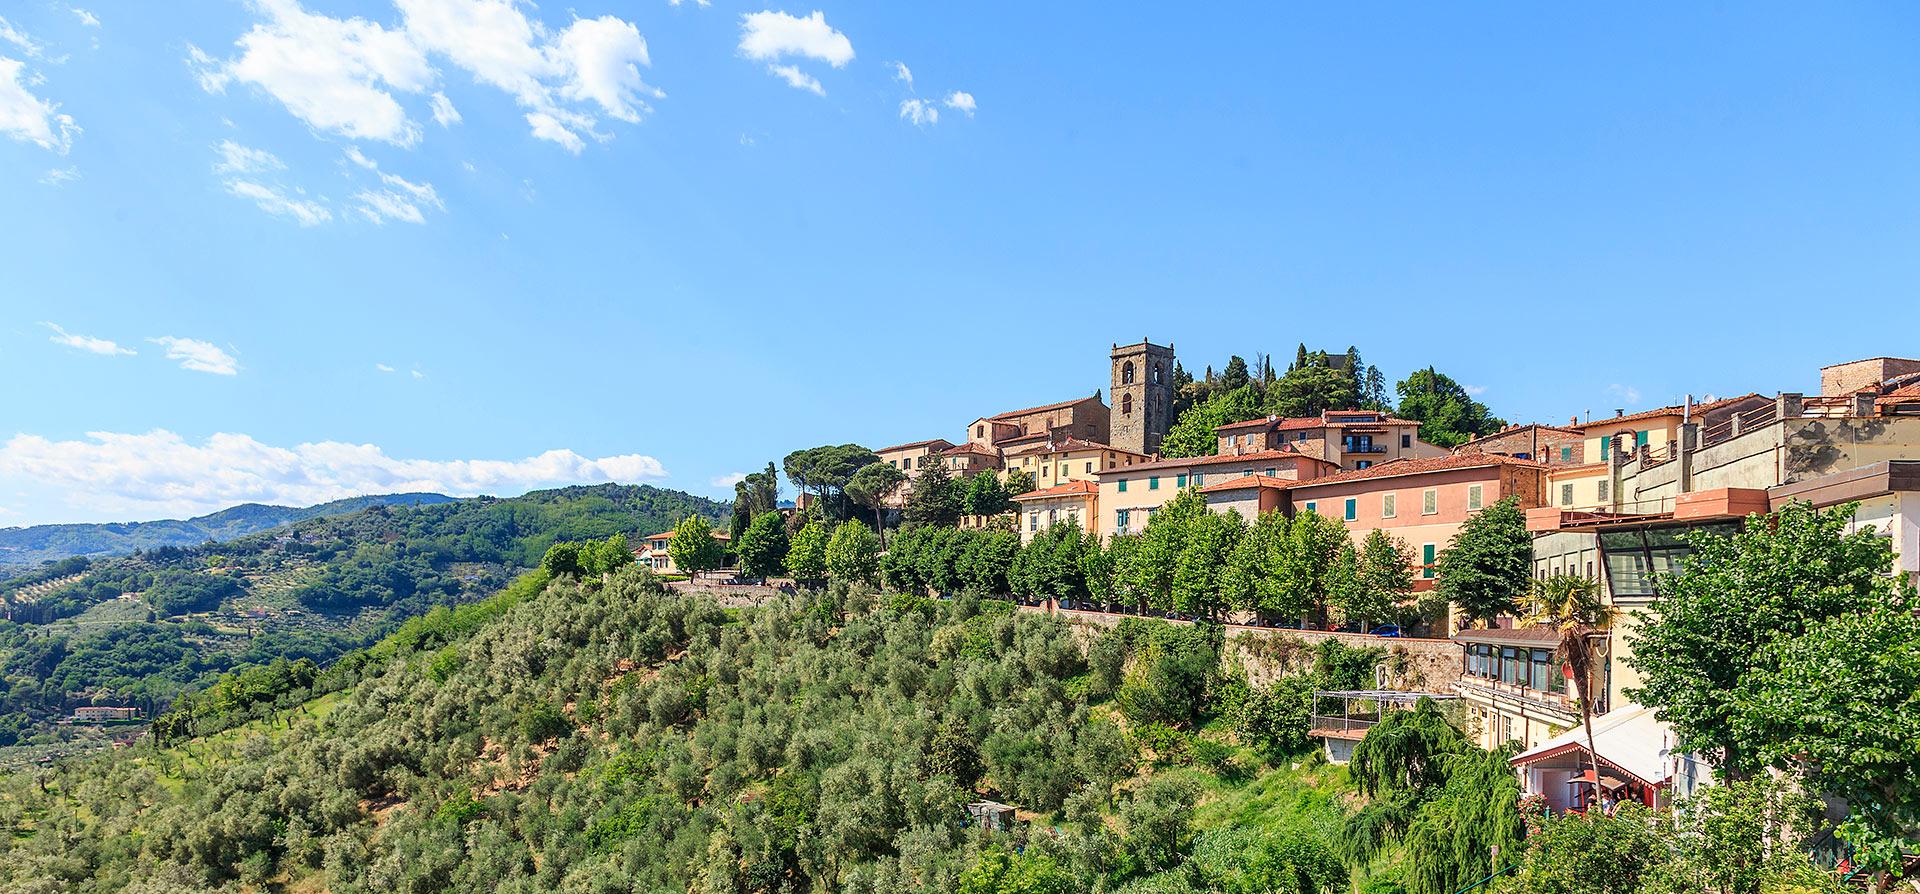 Toscana resa italien Montecatini Alto